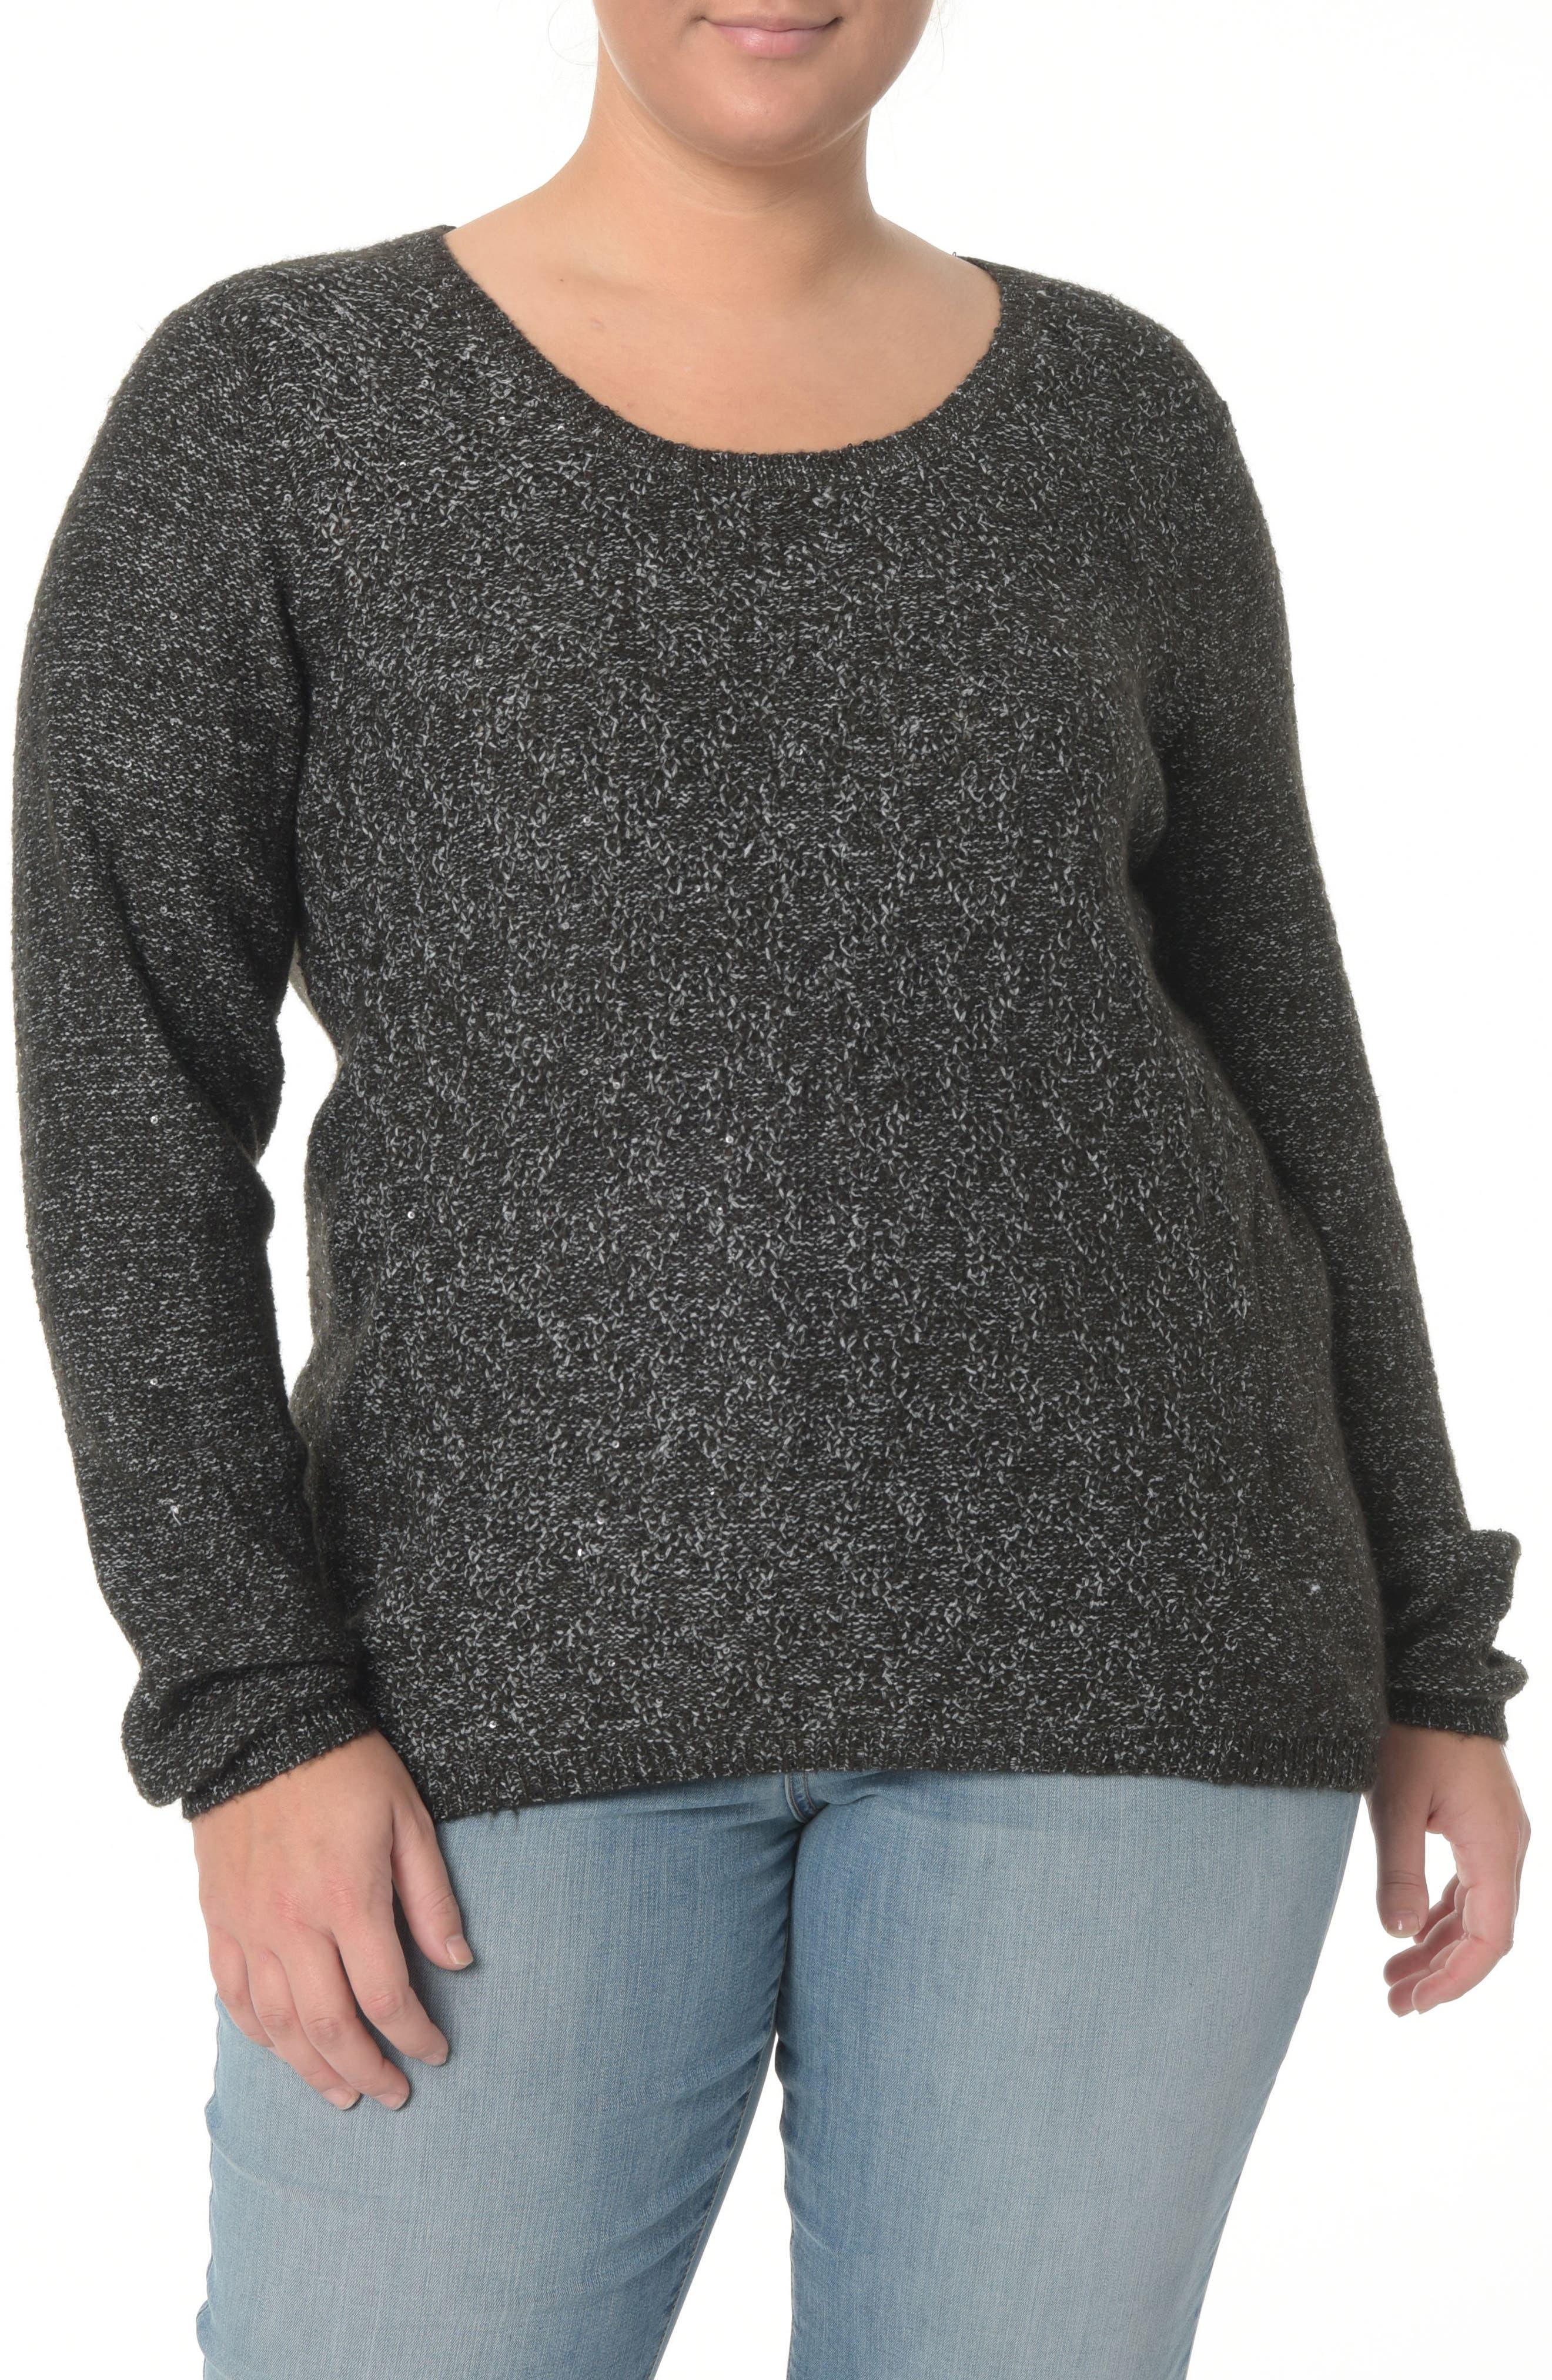 Sequin Scoop Neck Sweater,                             Main thumbnail 1, color,                             BLACK